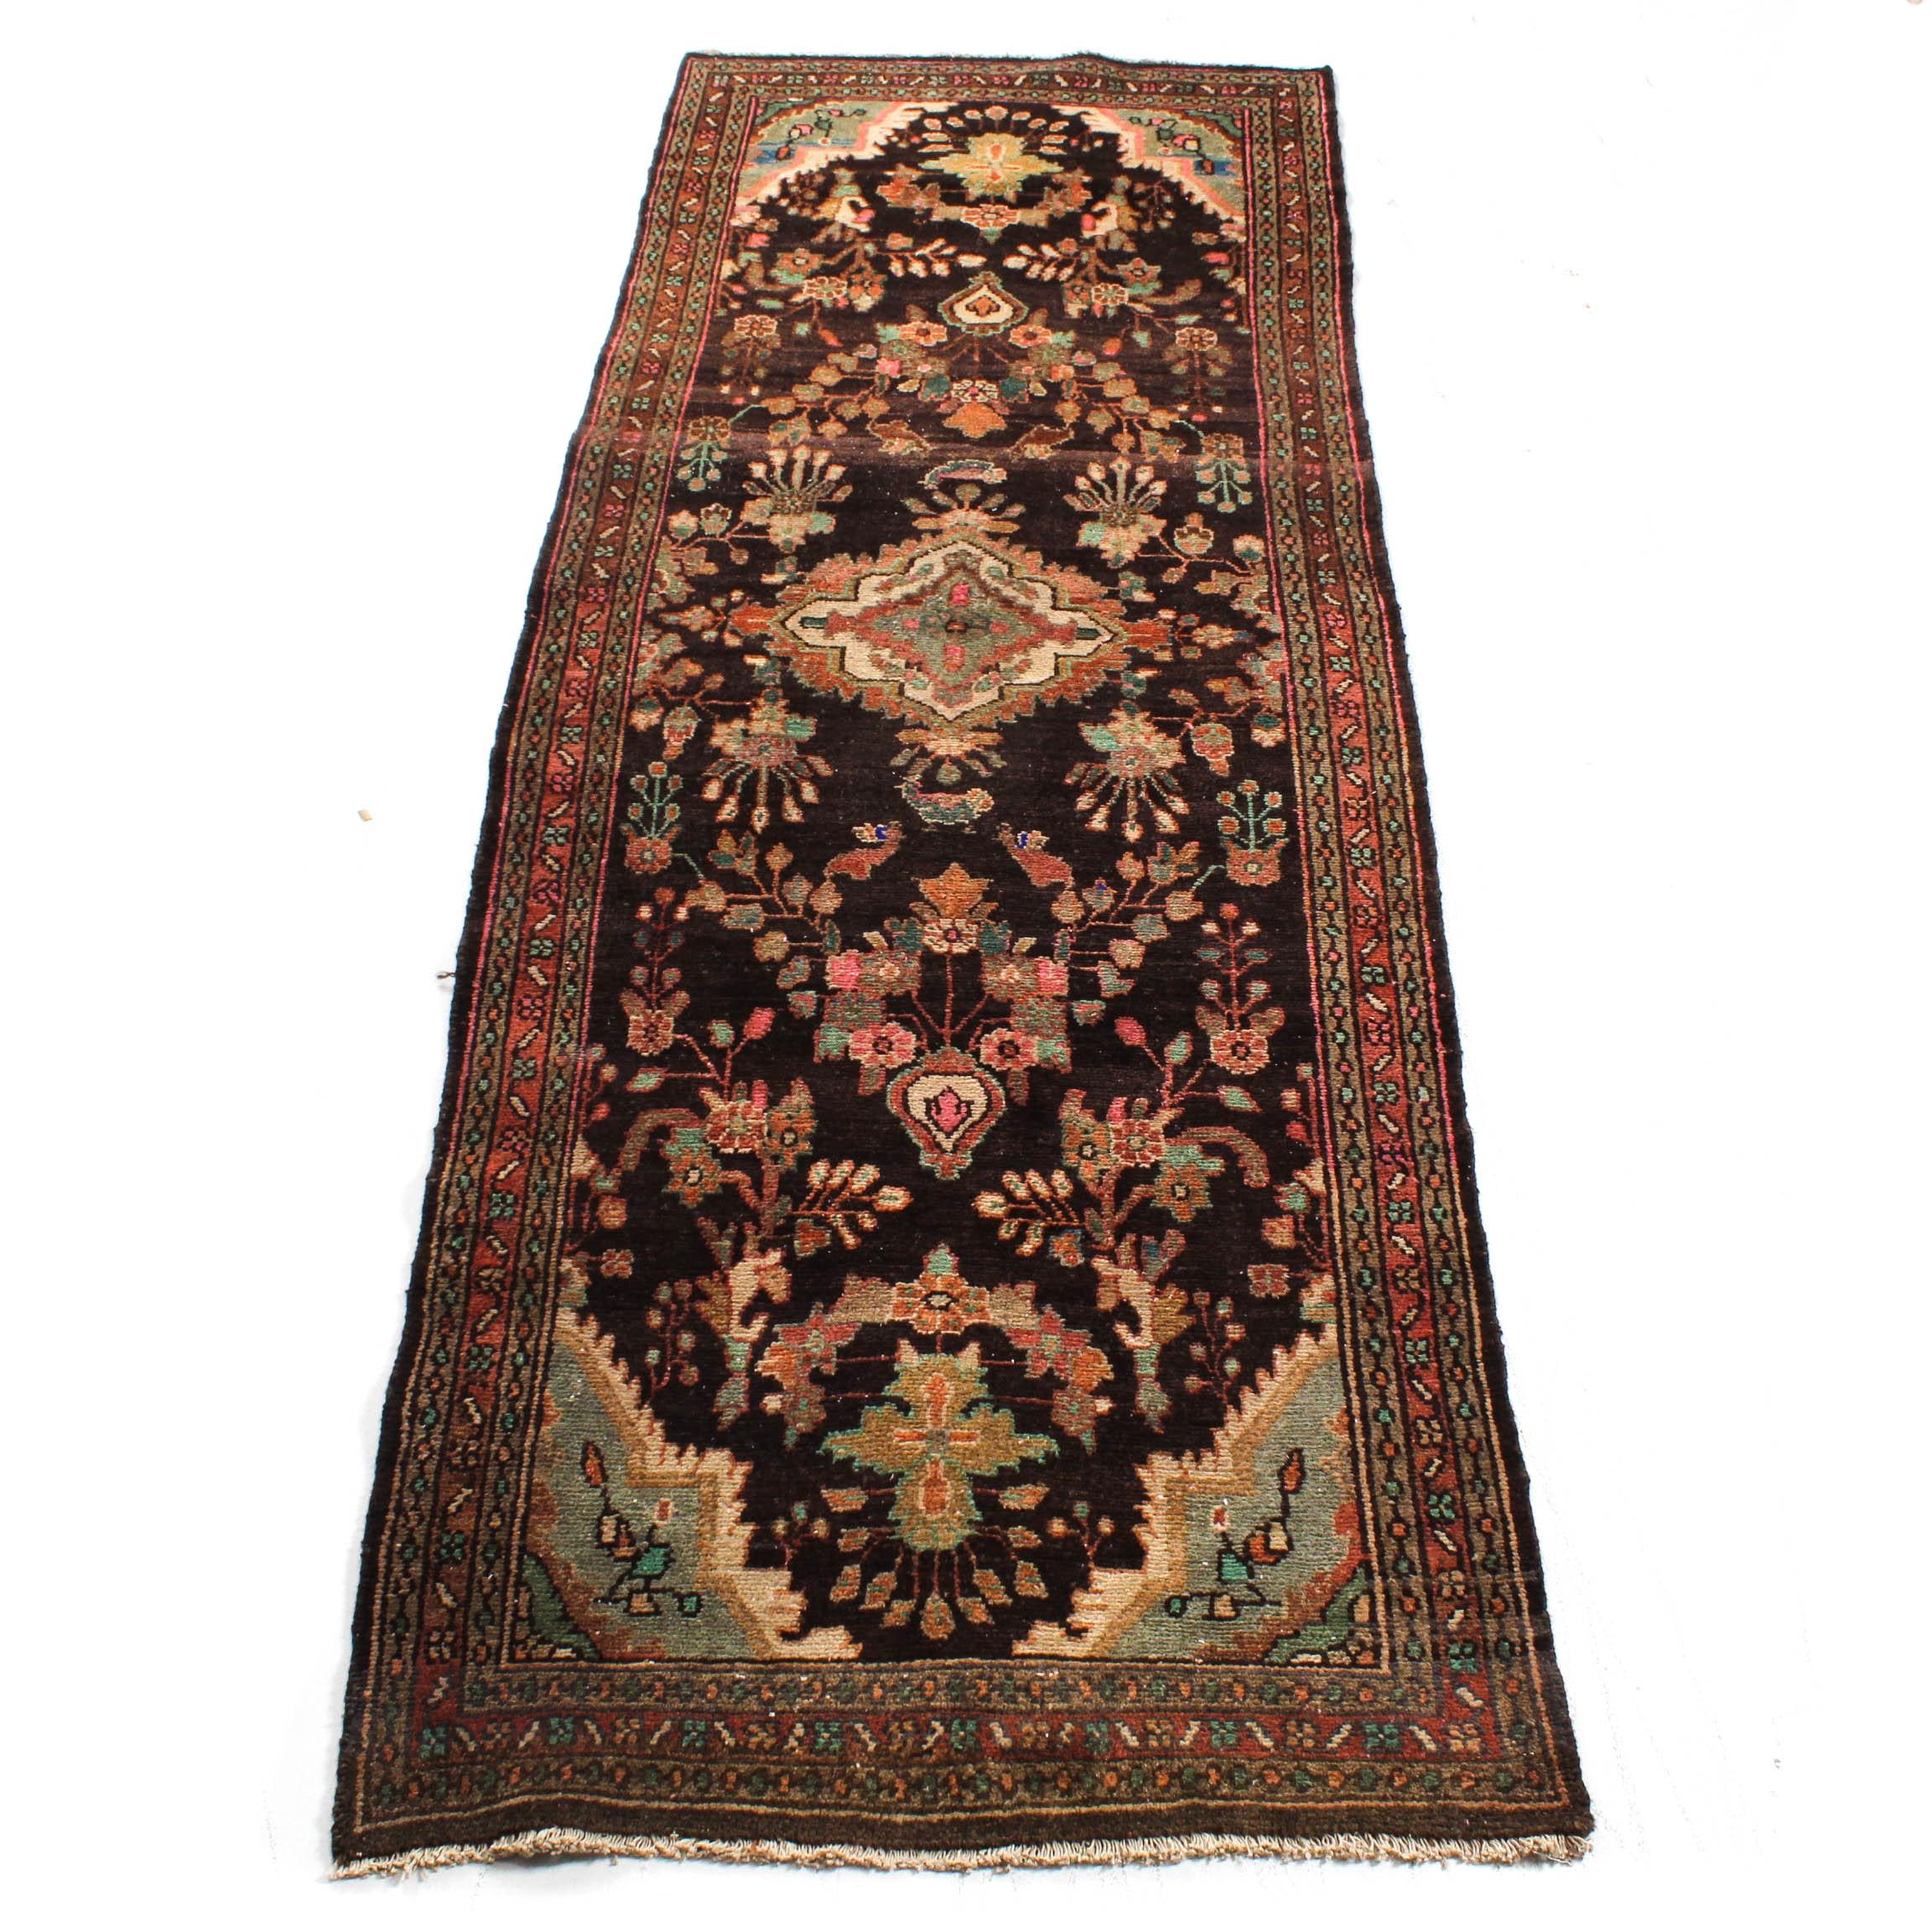 Vintage Hand-Knotted Persian Mahal Sarouk Rug Runner